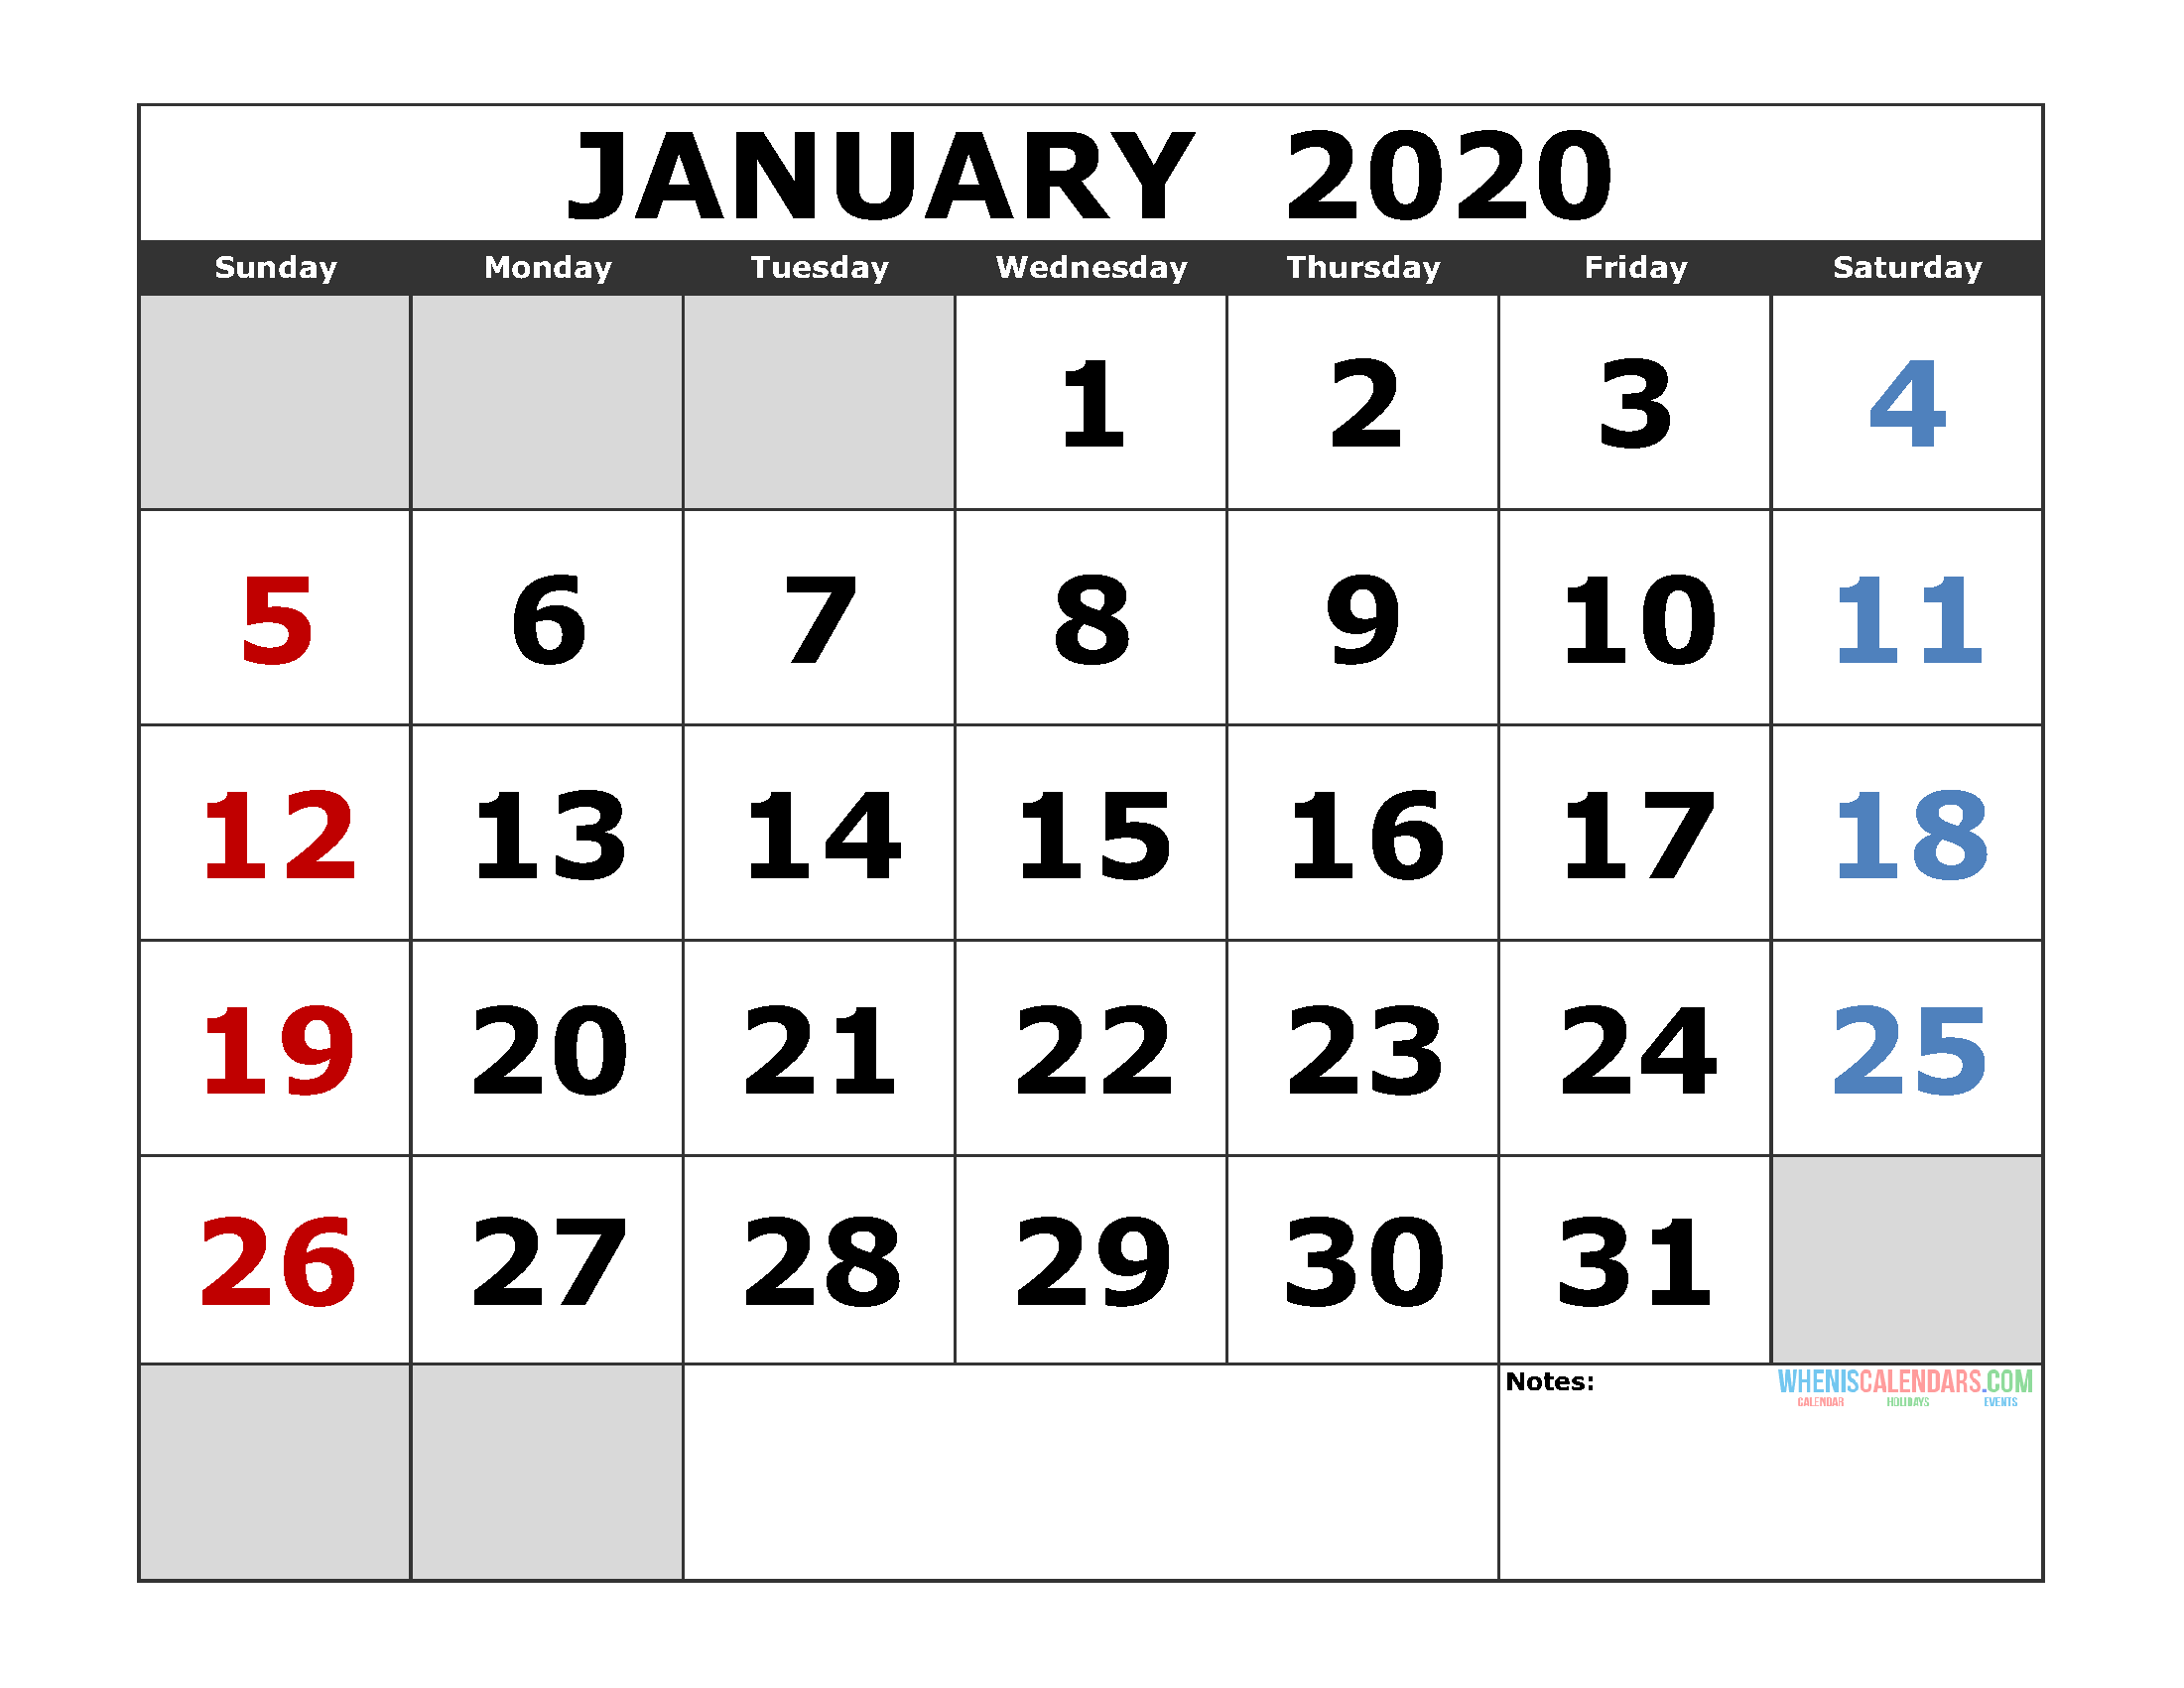 January 2020 Calendar Template.January 2020 Printable Calendar Template Excel Pdf Image Us